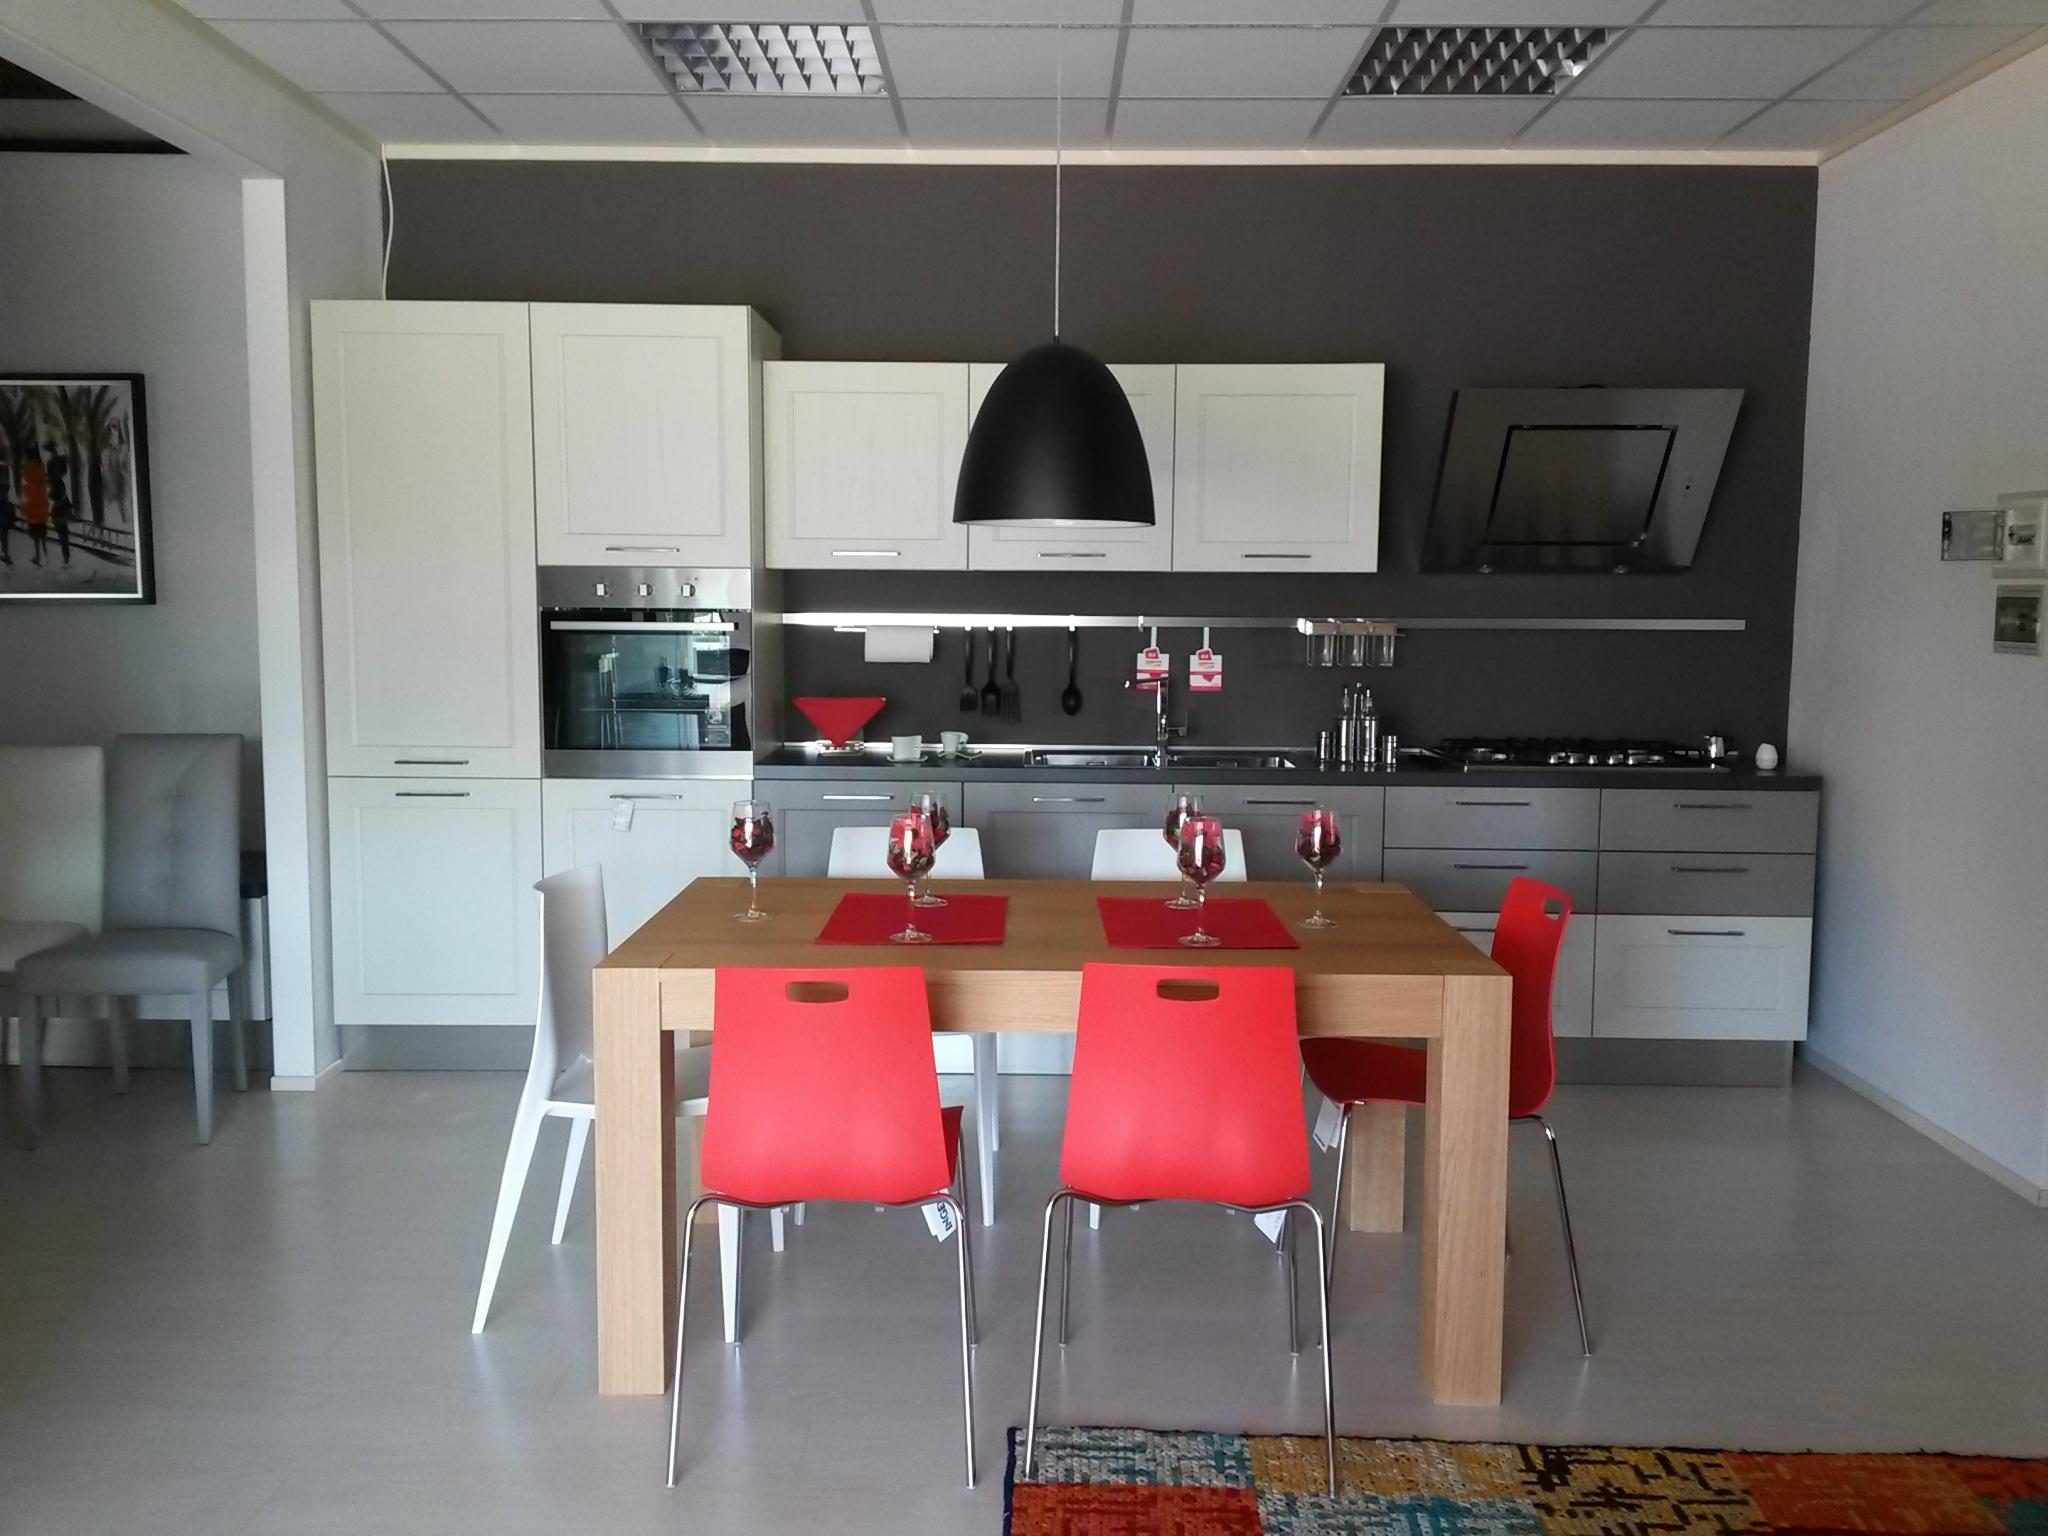 Cucine Con Pavimento Grigio ~ avienix.com for .